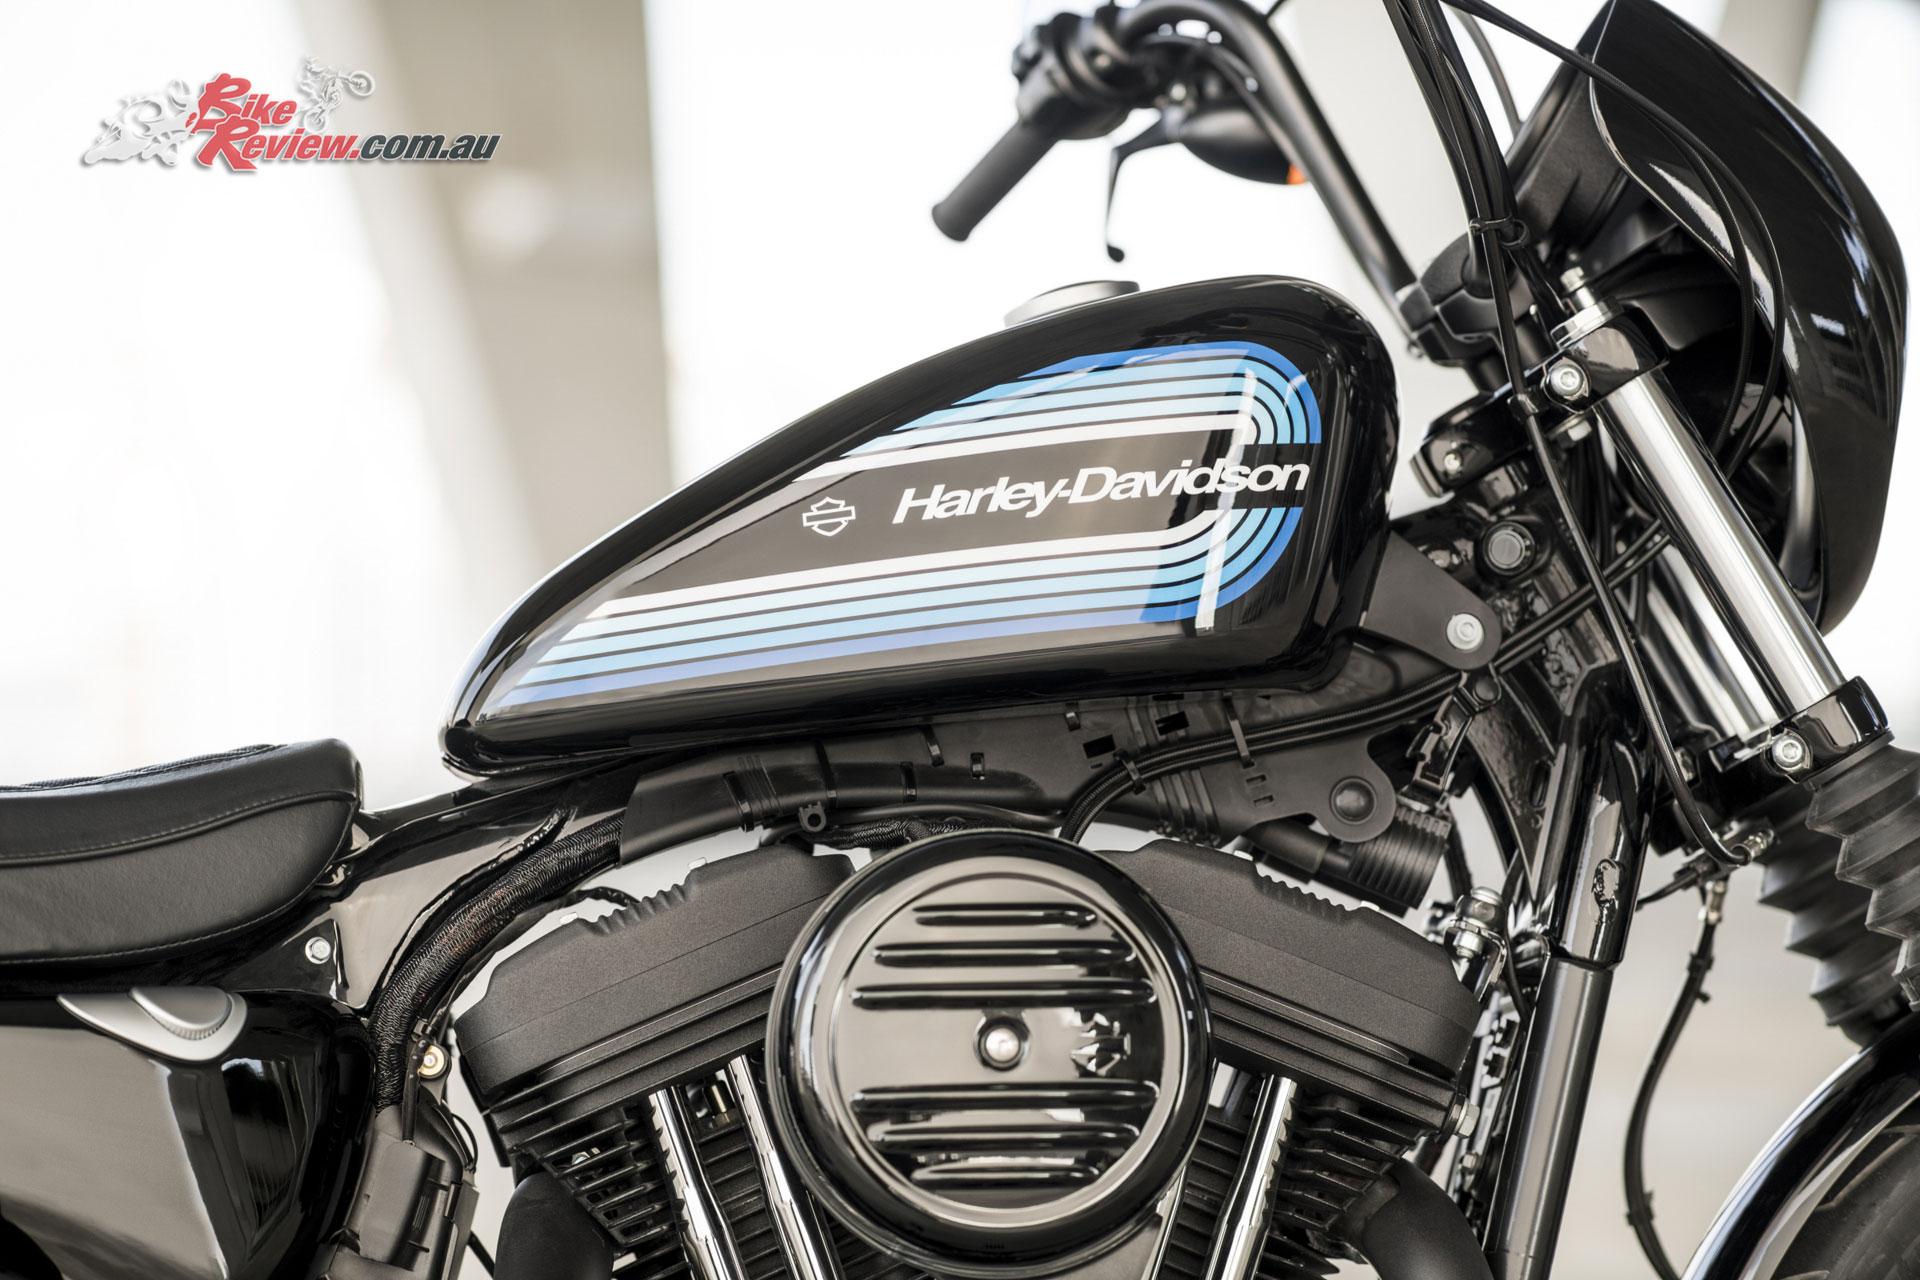 Harley Davidson Iron  Review